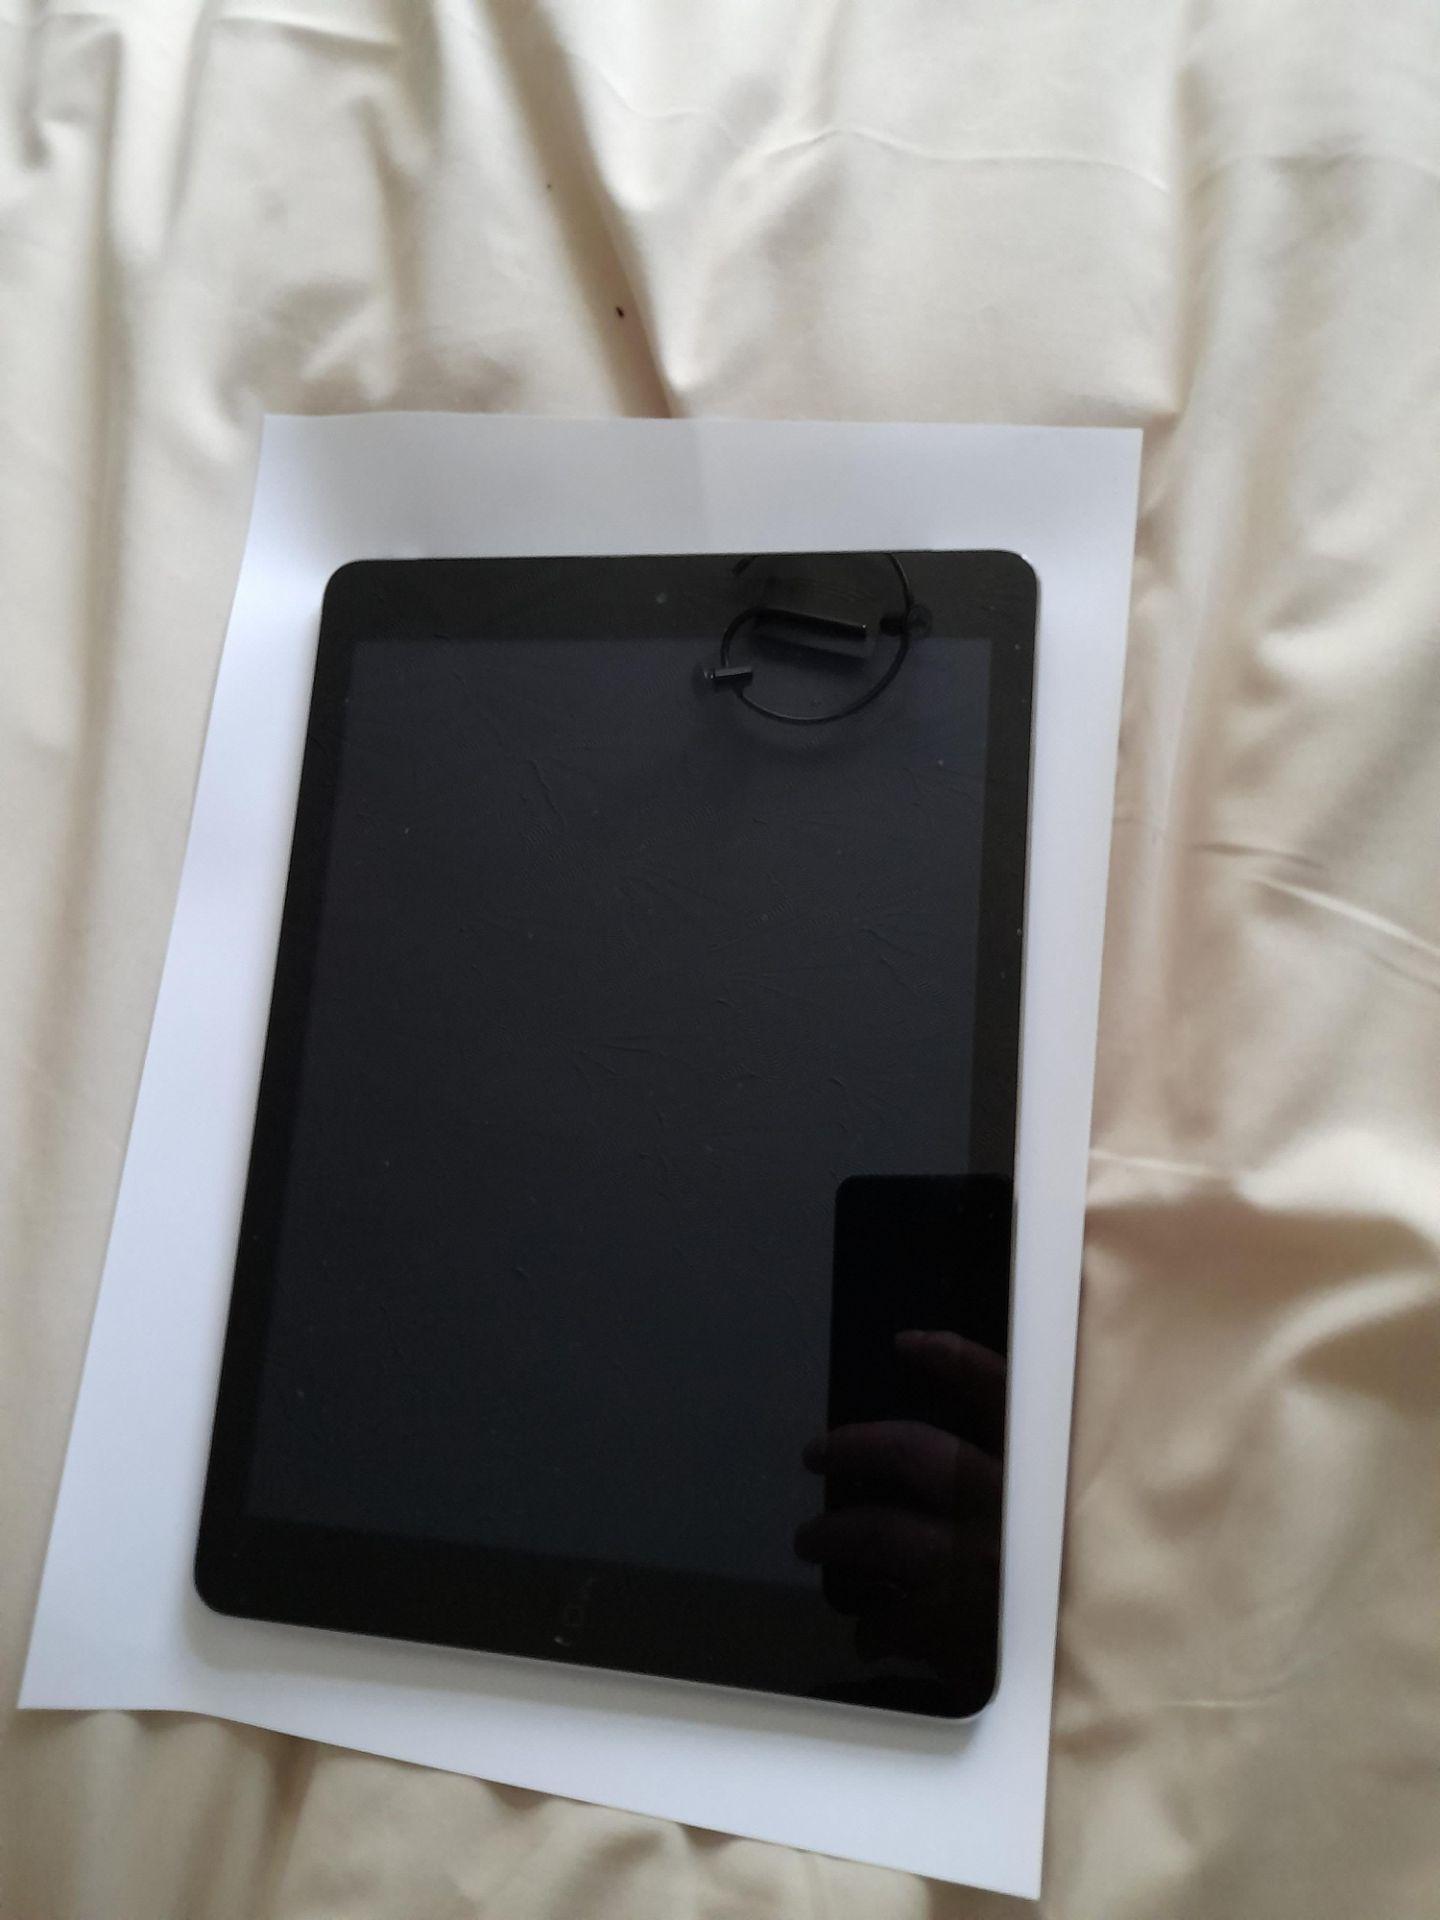 Apple iPad Air, 16GB, Model A1475, Serial Number D